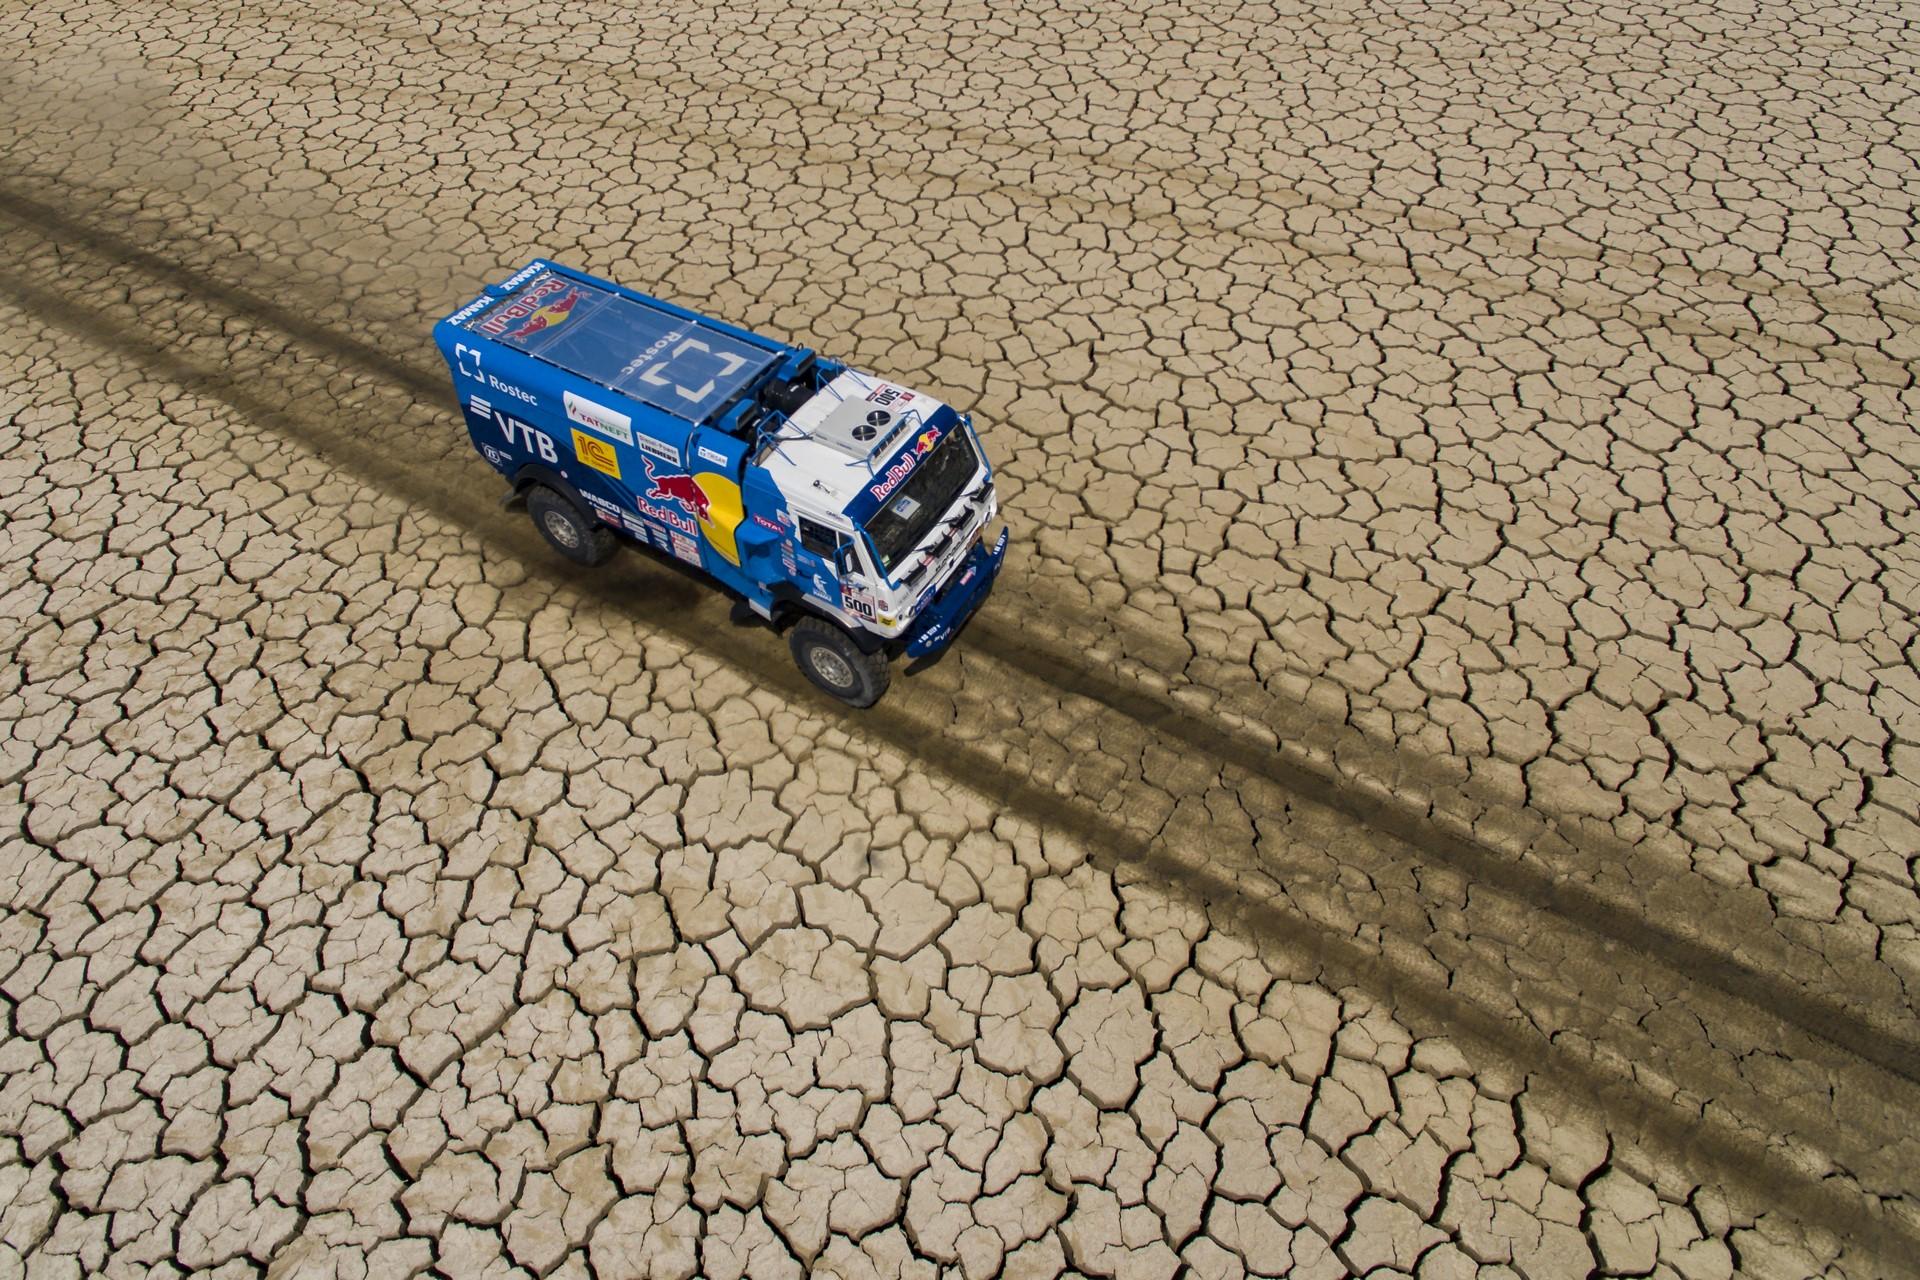 Eduard Nikolaev (RUS) of Team KAMAZ-Master races during stage 03 of Rally Dakar 2018 from Pisco to Marcona, Peru on January 8, 2018